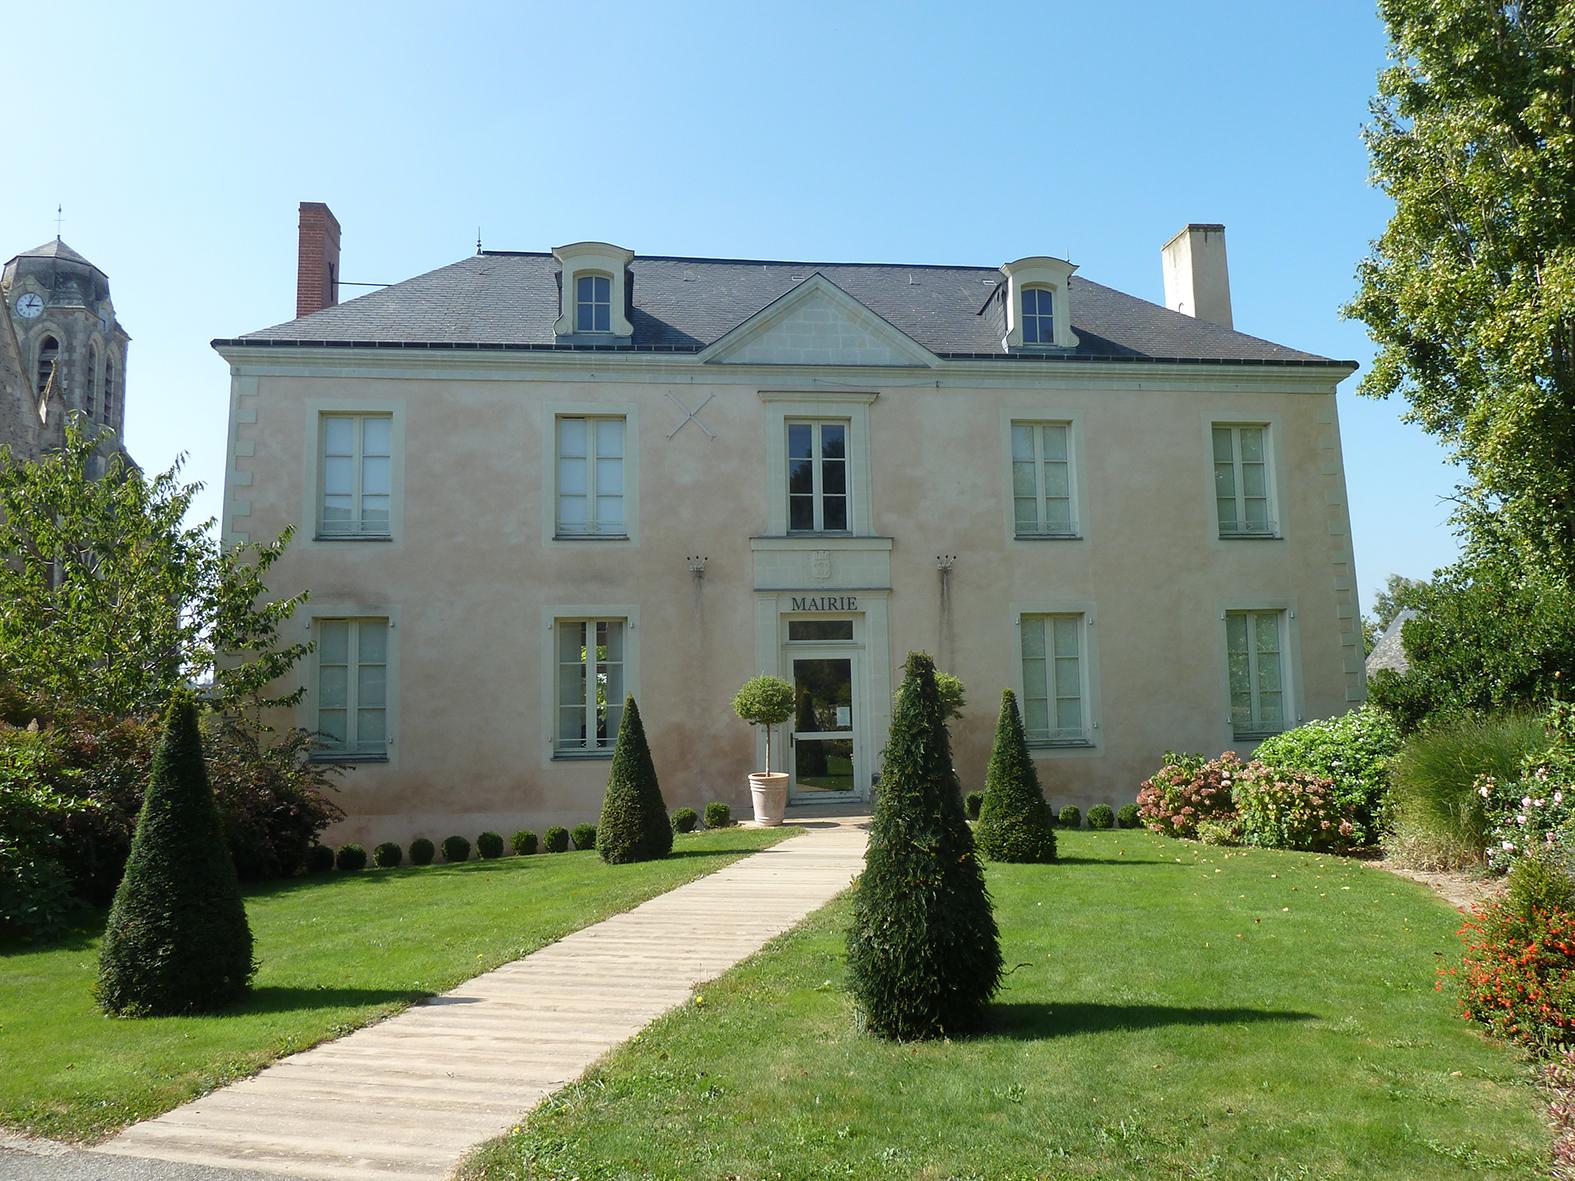 Mairie de Houssay